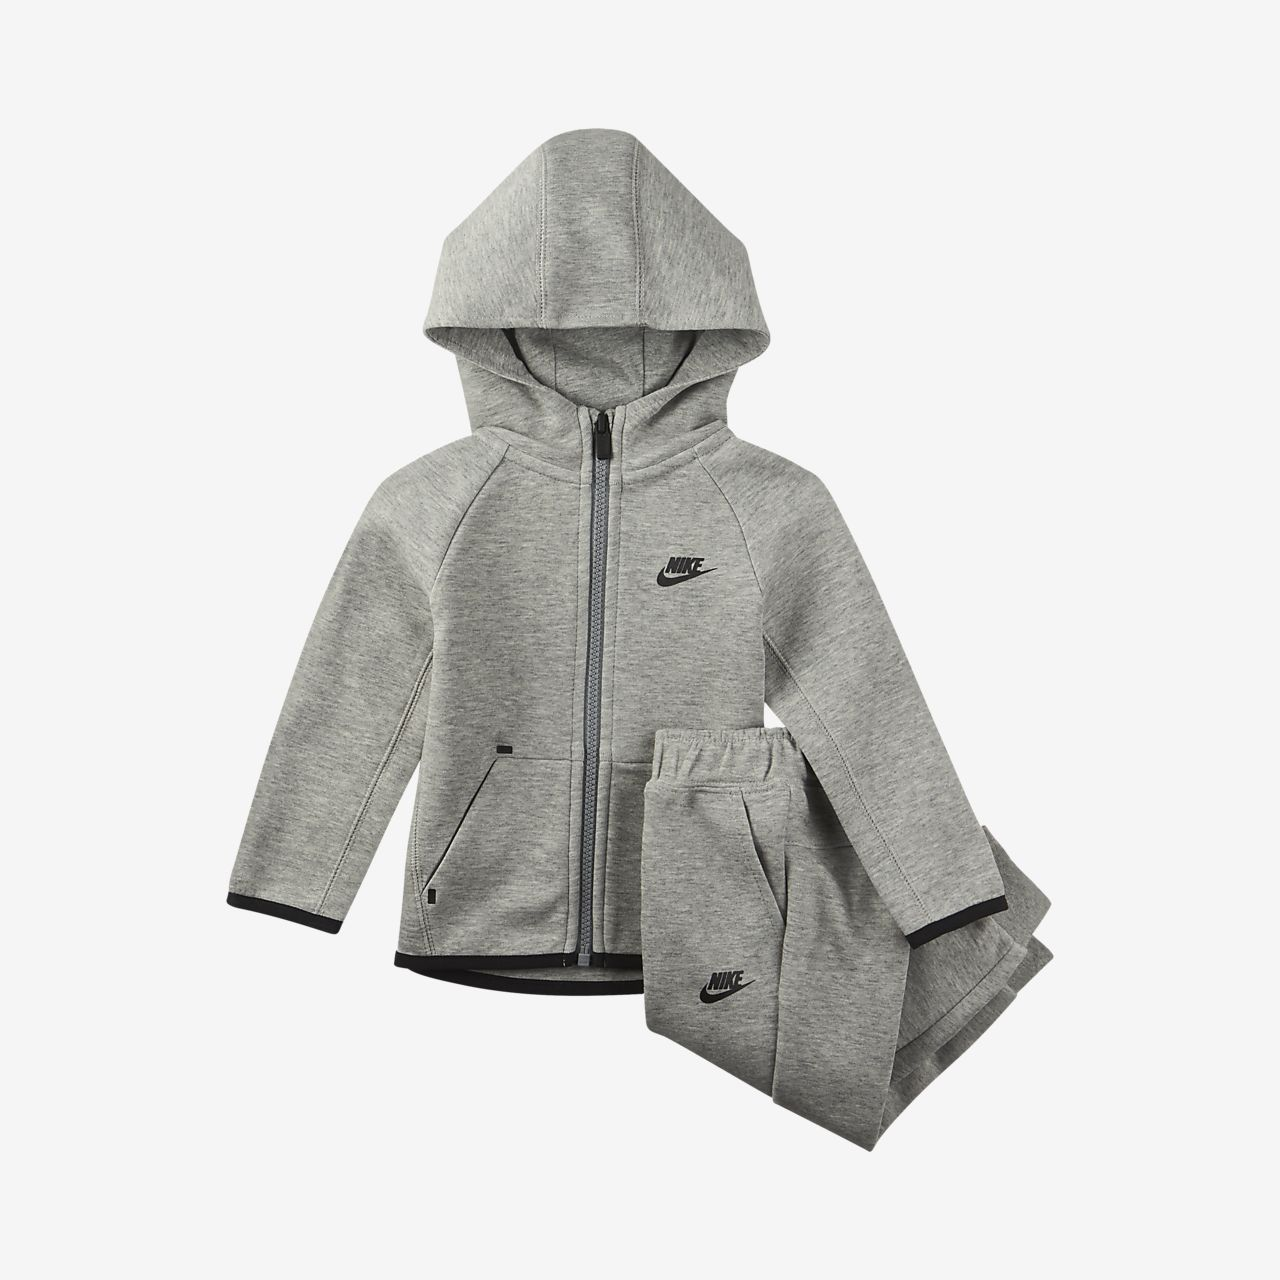 Nike Sportswear Tech Fleece Conjunt de dessuadora amb caputxa i joggers - Nadó (12-24 M)